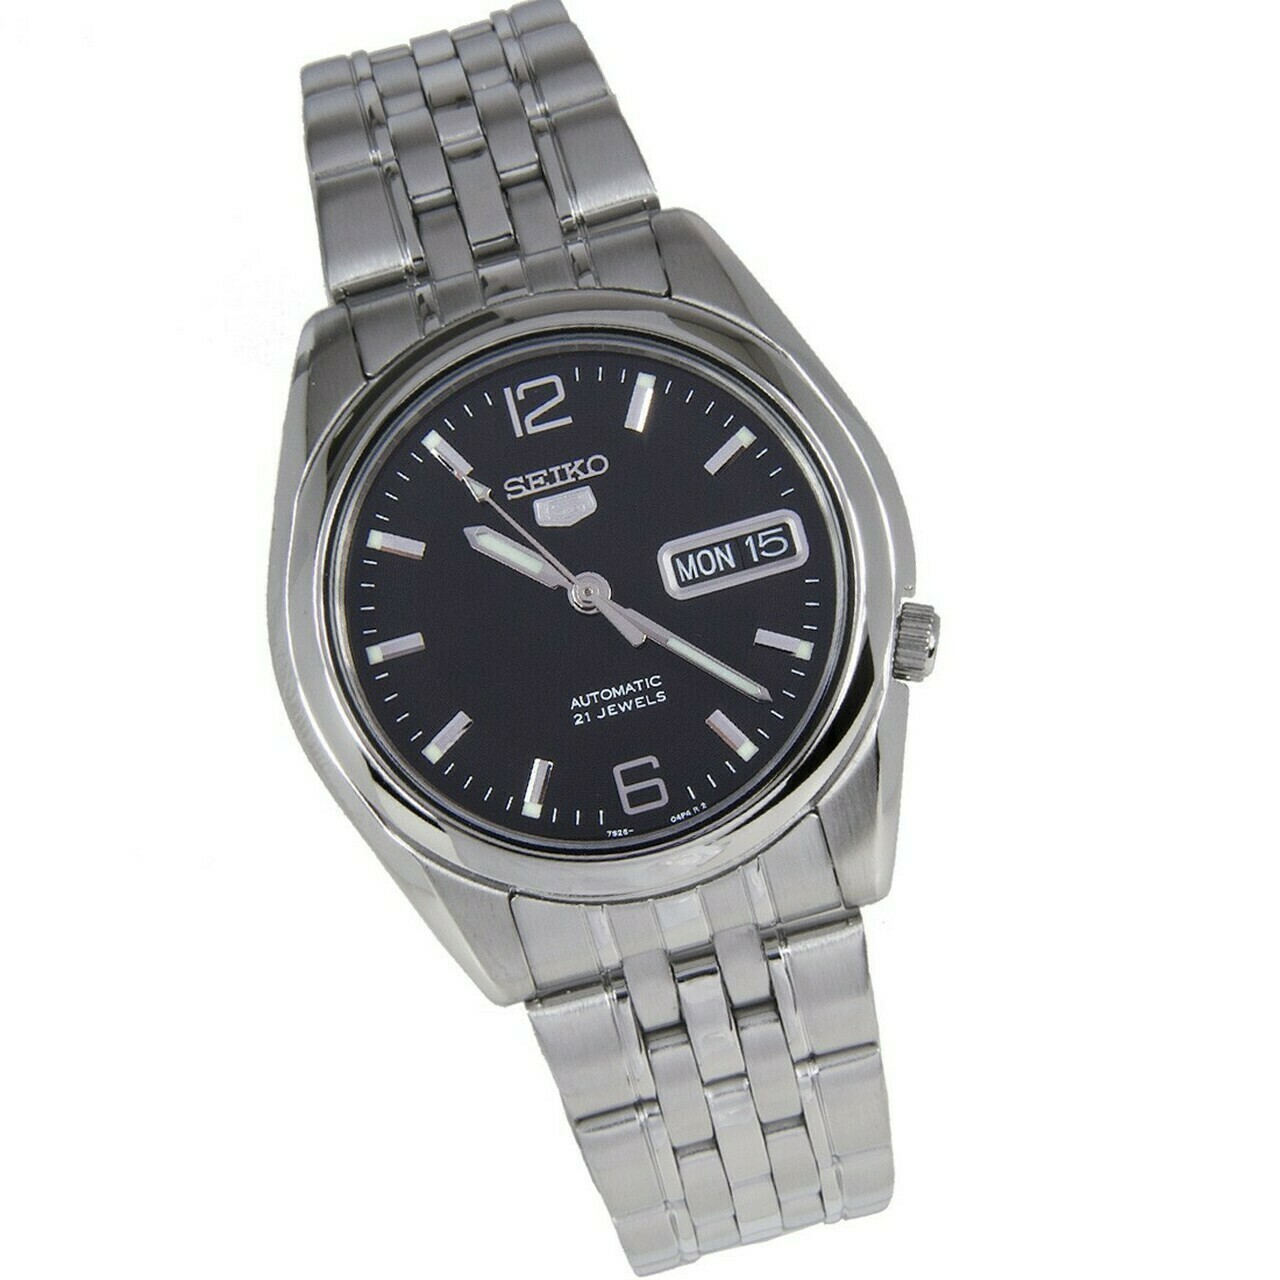 Reloj Automático hombre Seiko 5 SNKL23K1 38mm dial negro correa acero inoxidable